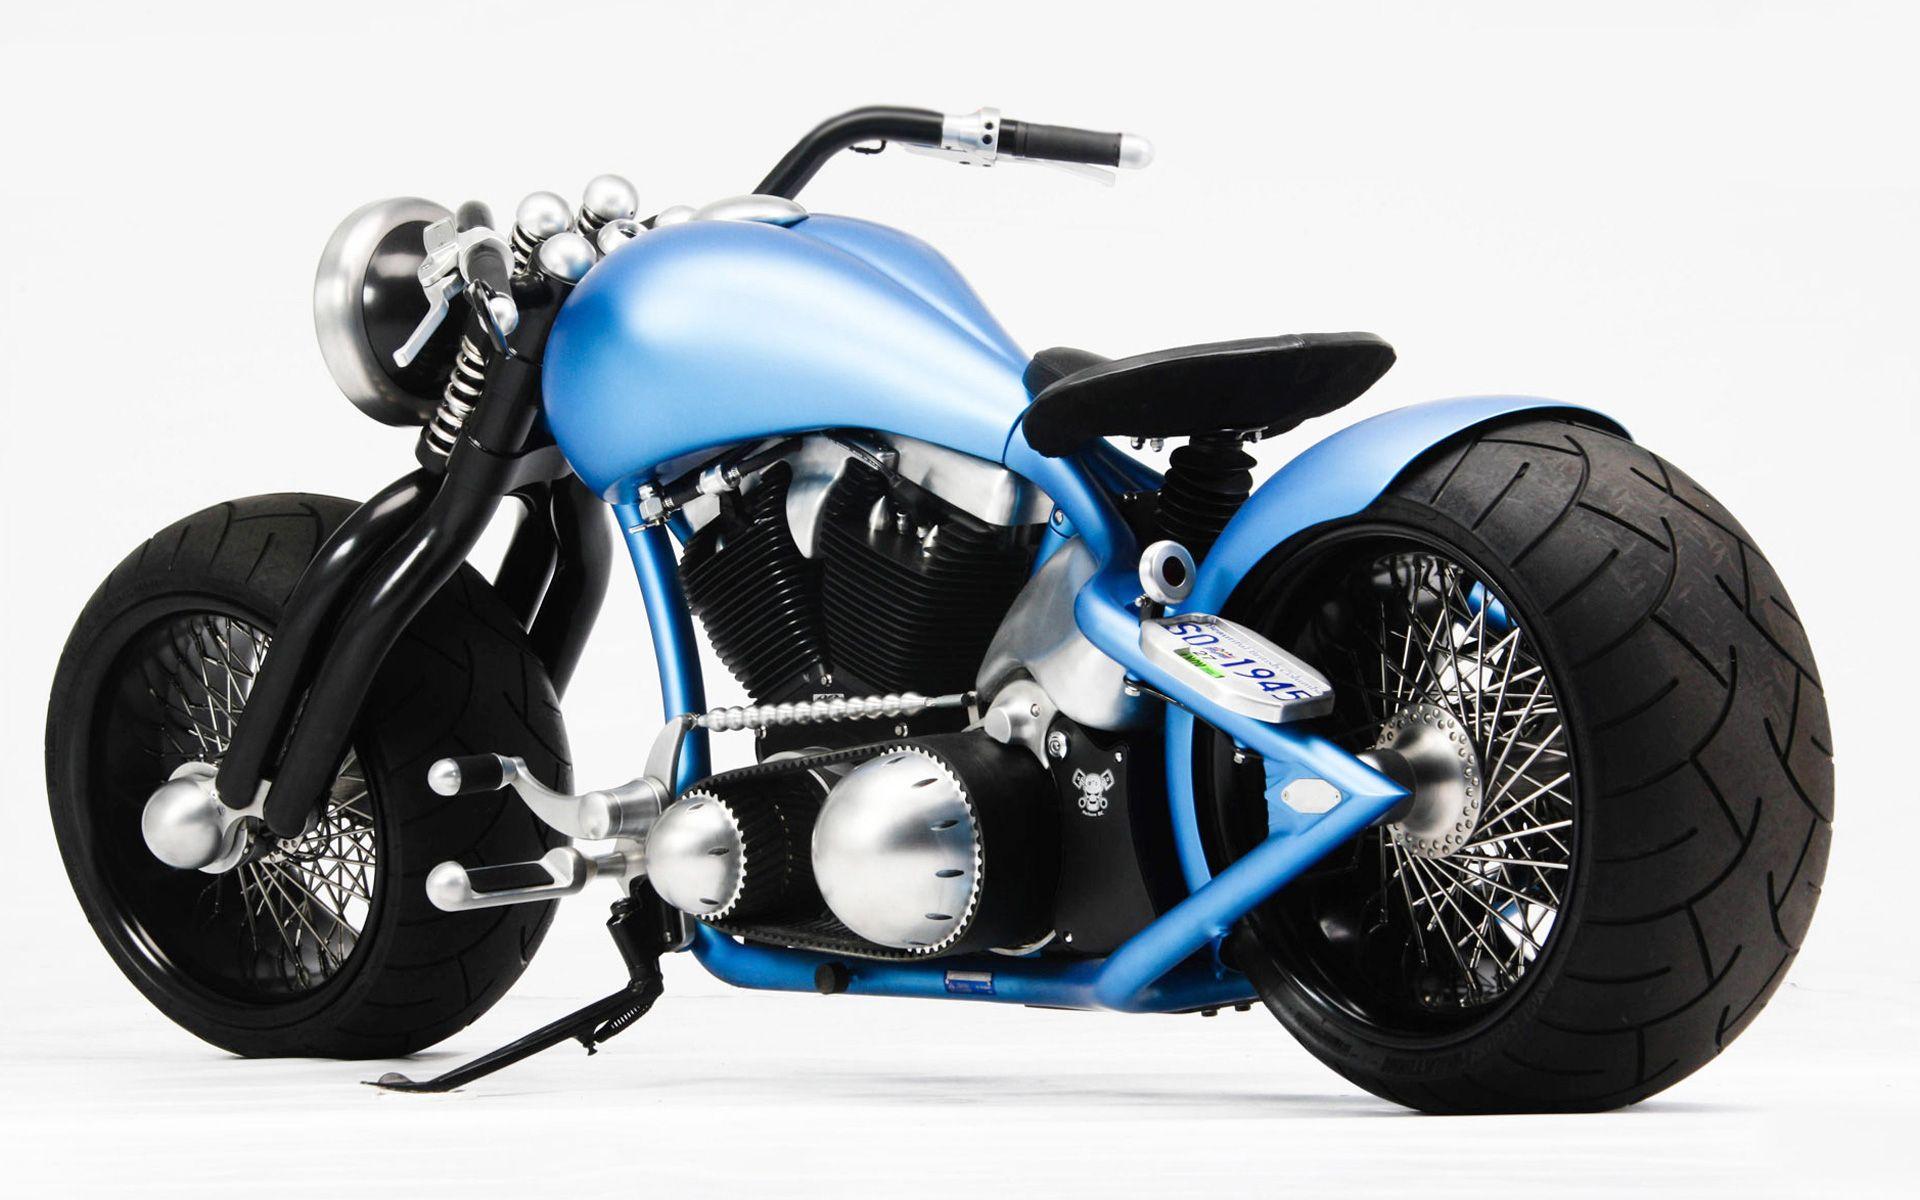 american choppers bike hd wallpaper bikes hd wallpapers. Black Bedroom Furniture Sets. Home Design Ideas